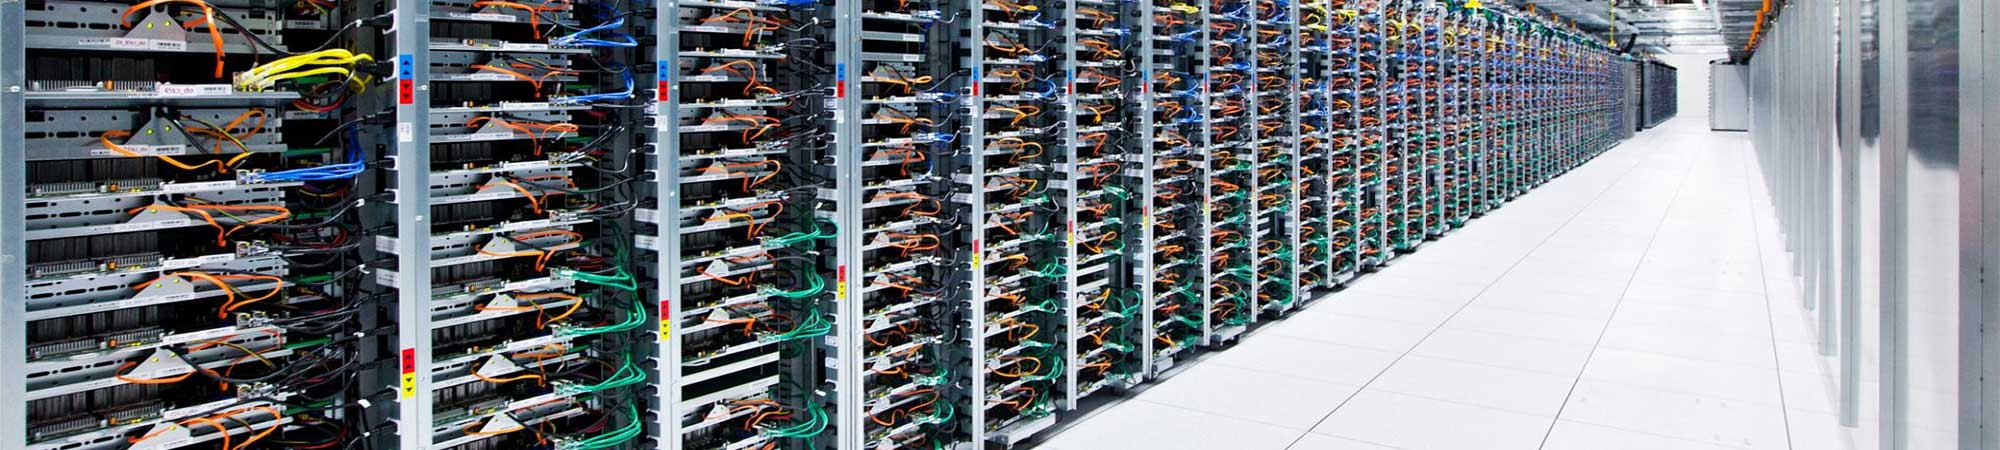 datacenter7